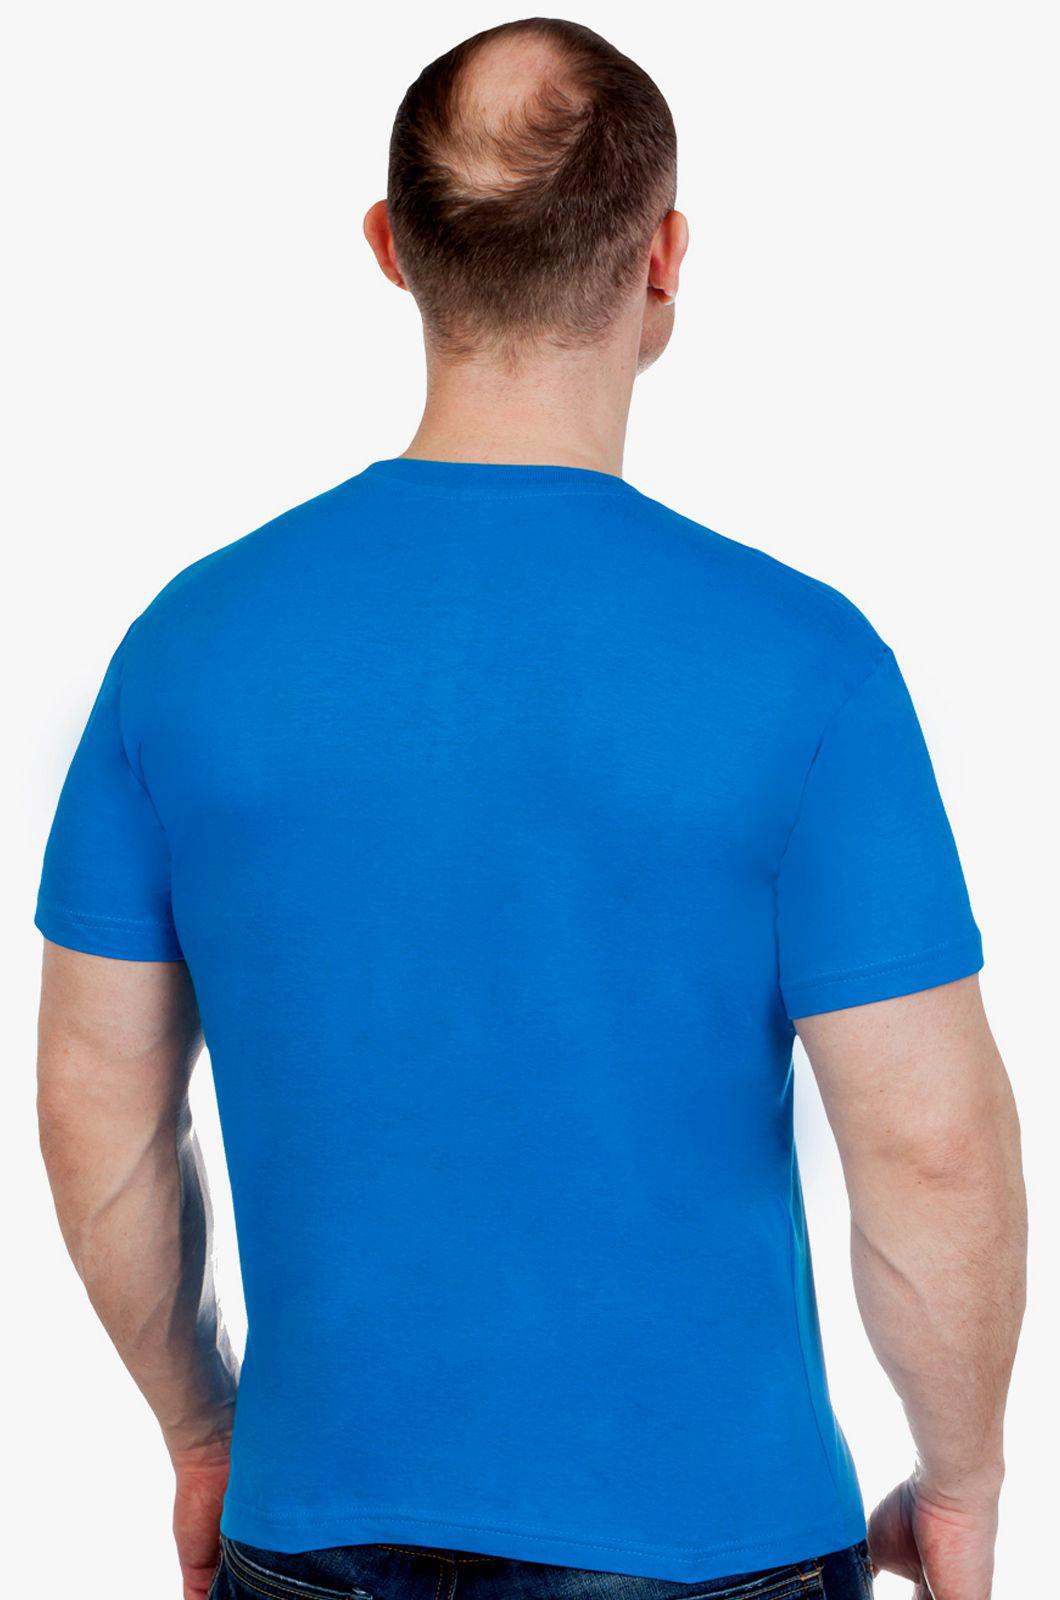 Комфортная синяя футболка Россия - заказать онлайн